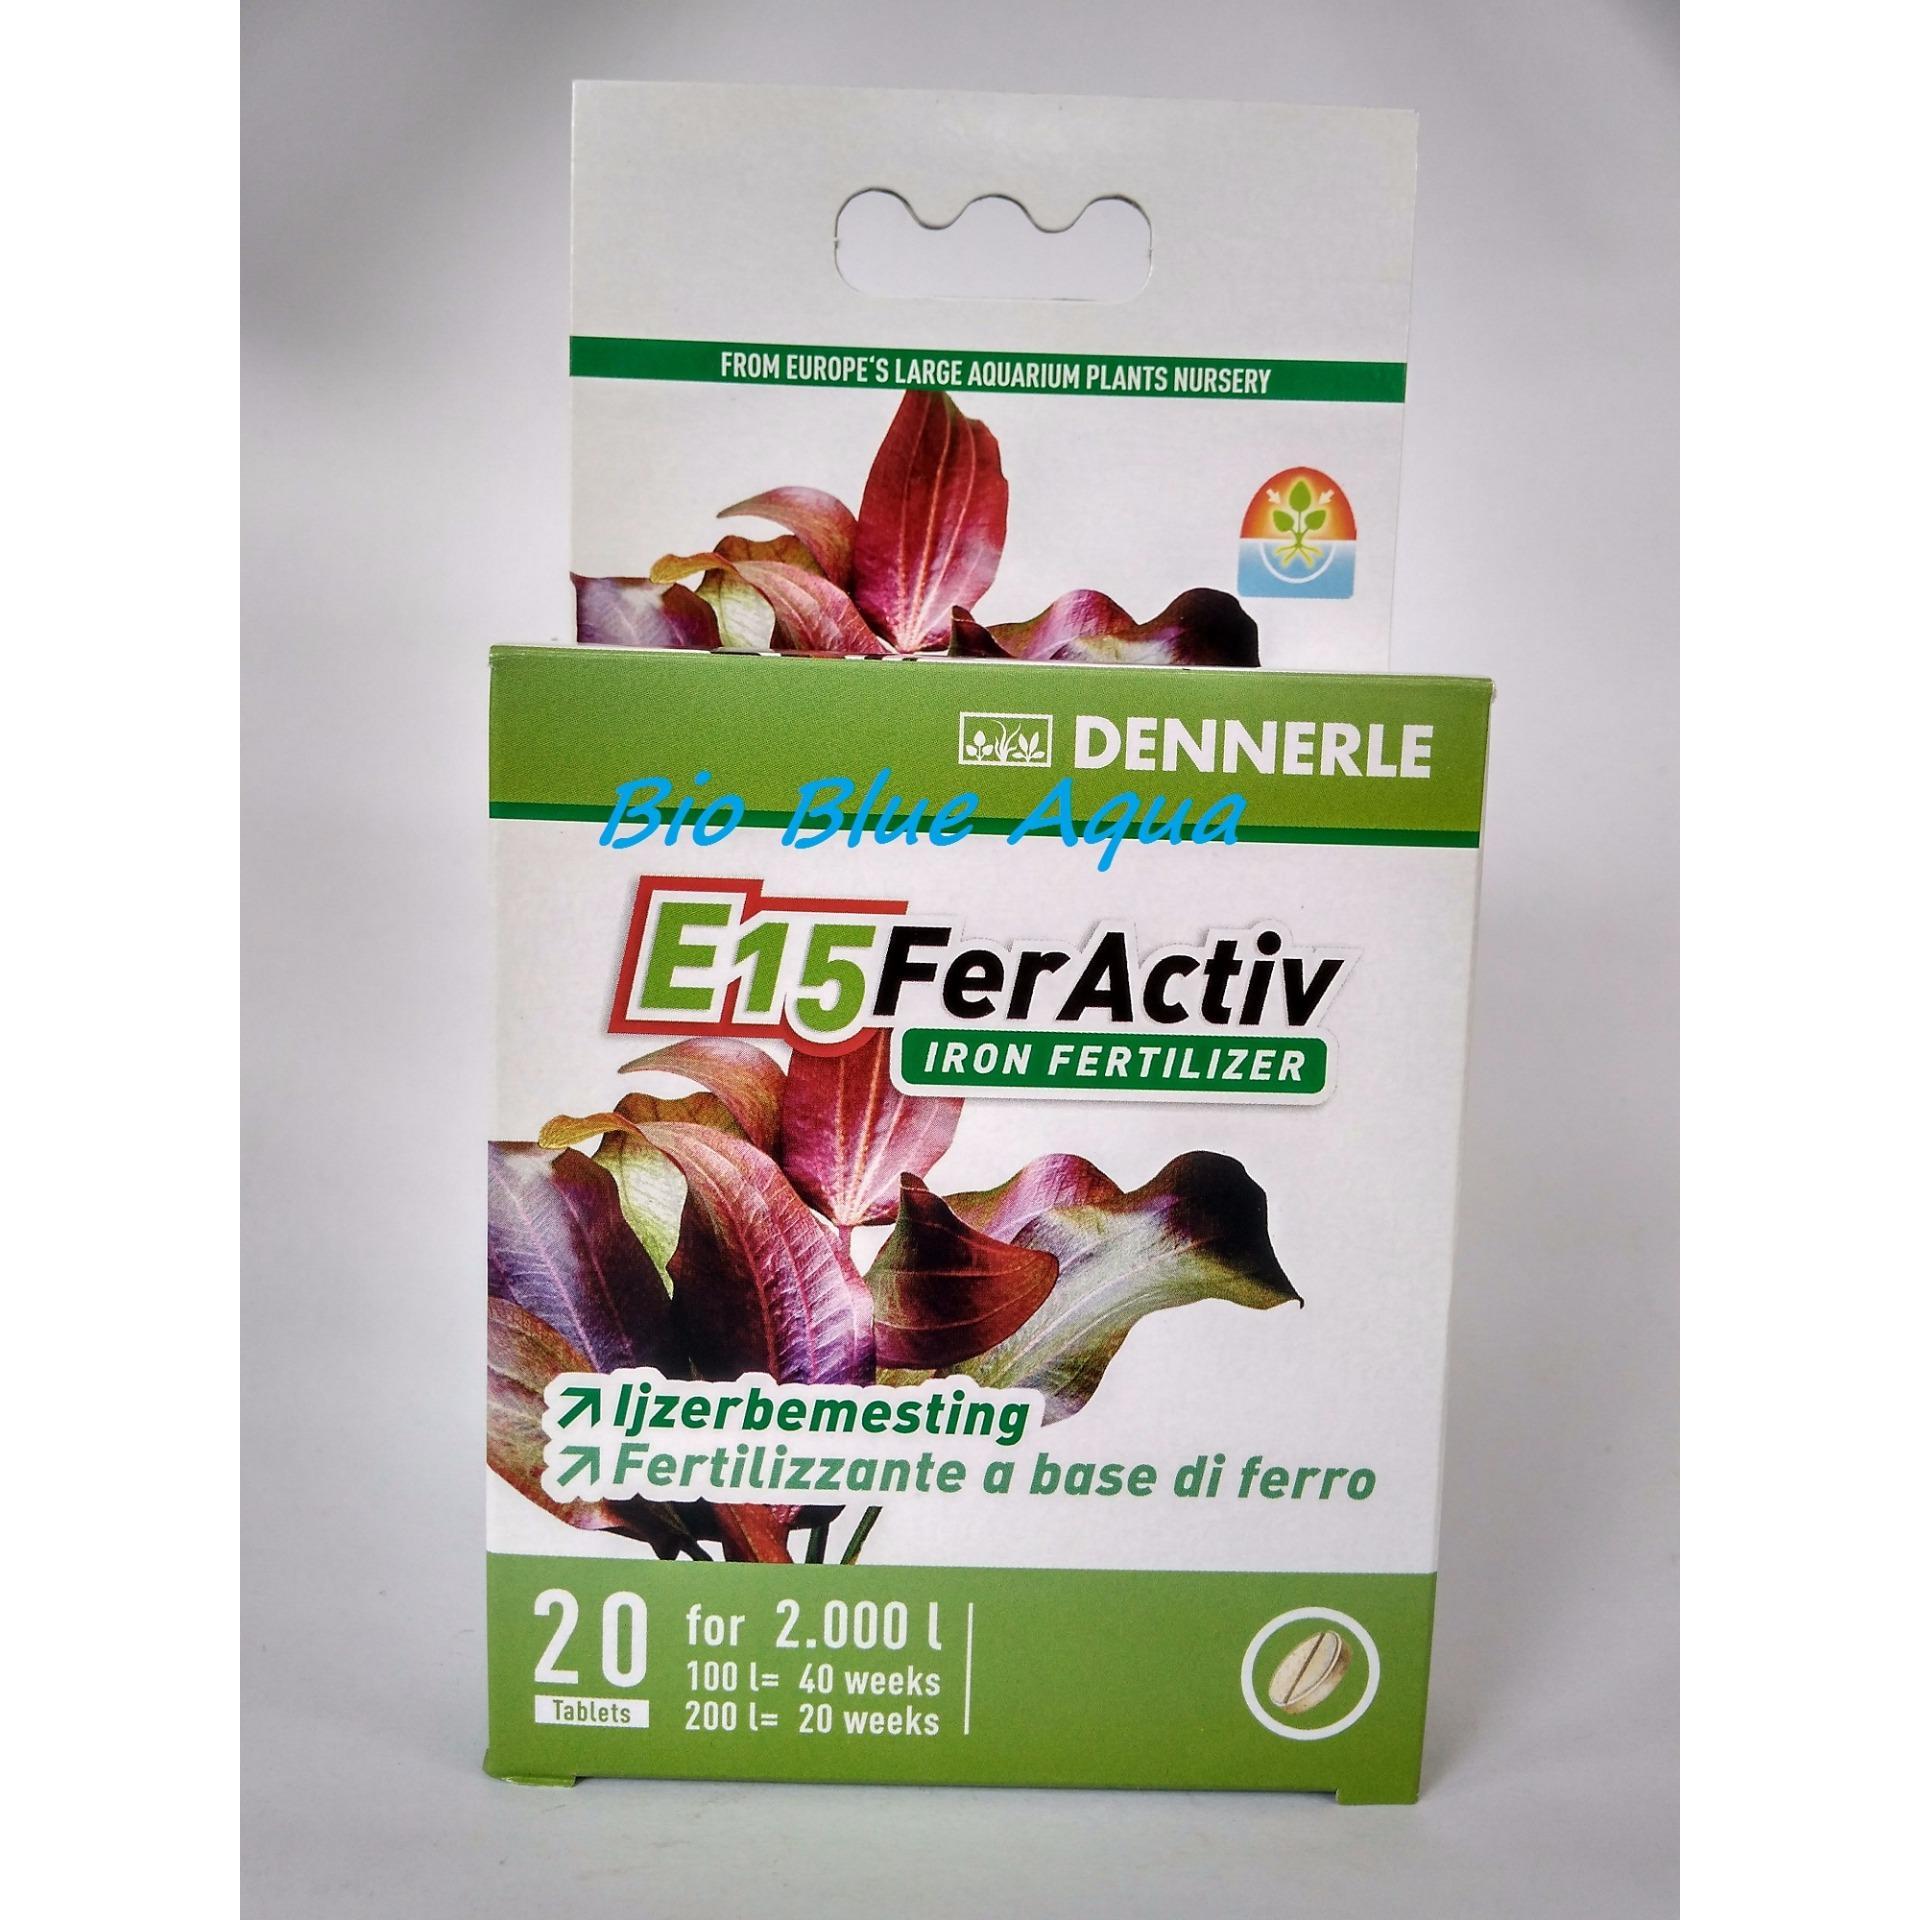 Dennerle E15 FerActiv 20 tablets ppupuk tanaman air